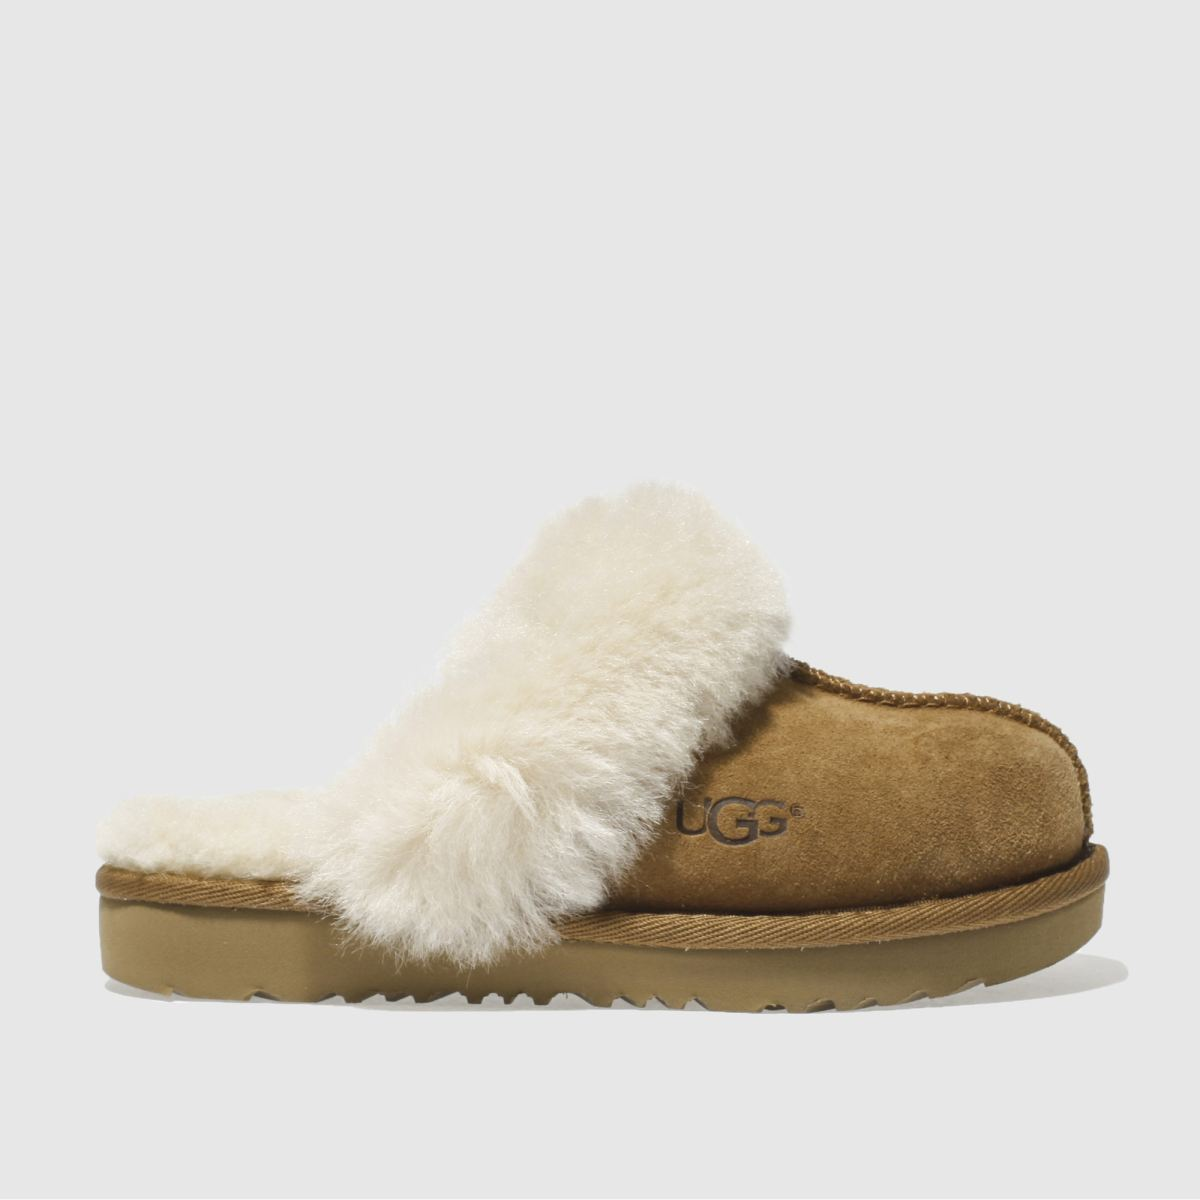 cf3117f08c7 Ugg Tan Cozy Ii Boots Junior | £55.00 | Bluewater